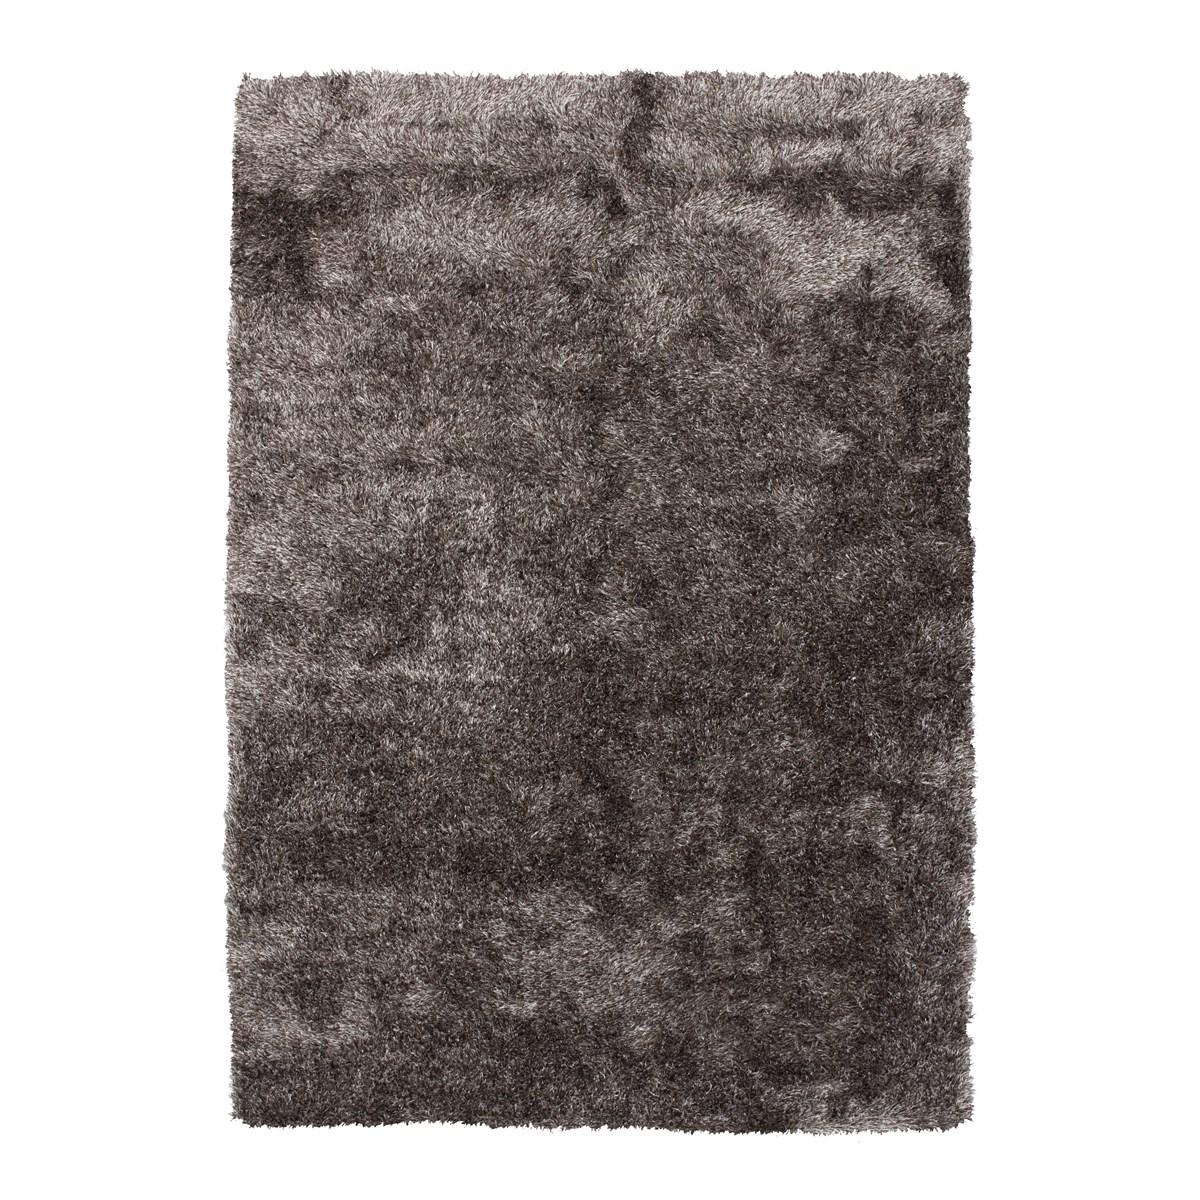 Tapis shaggy en Polyester Gris anthracite 120x170 cm